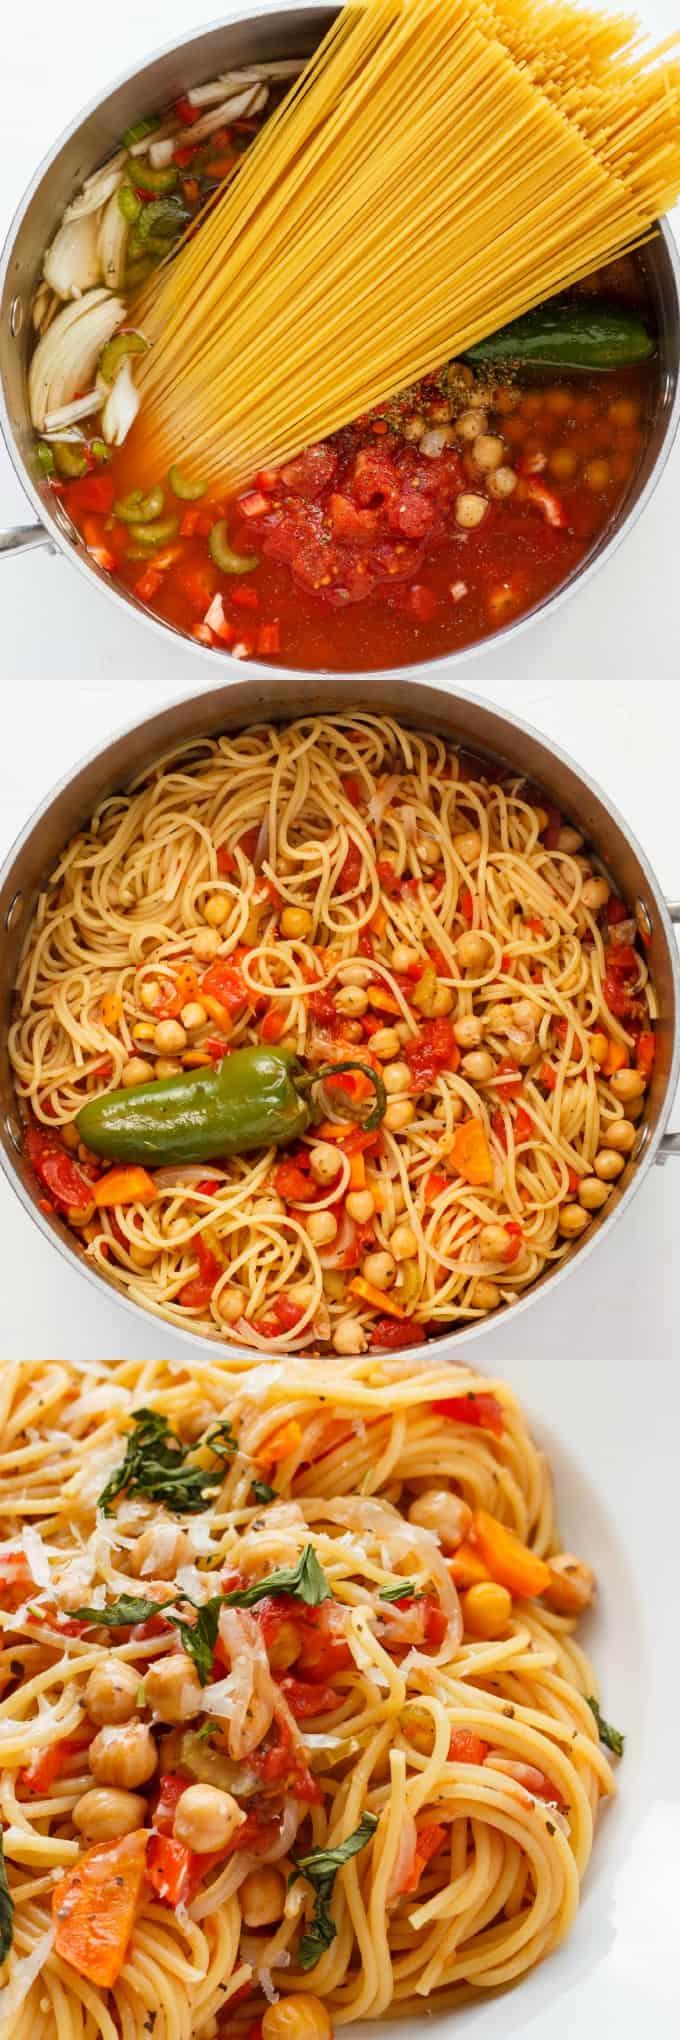 One-Pot Spaghetti Pasta Meal 1